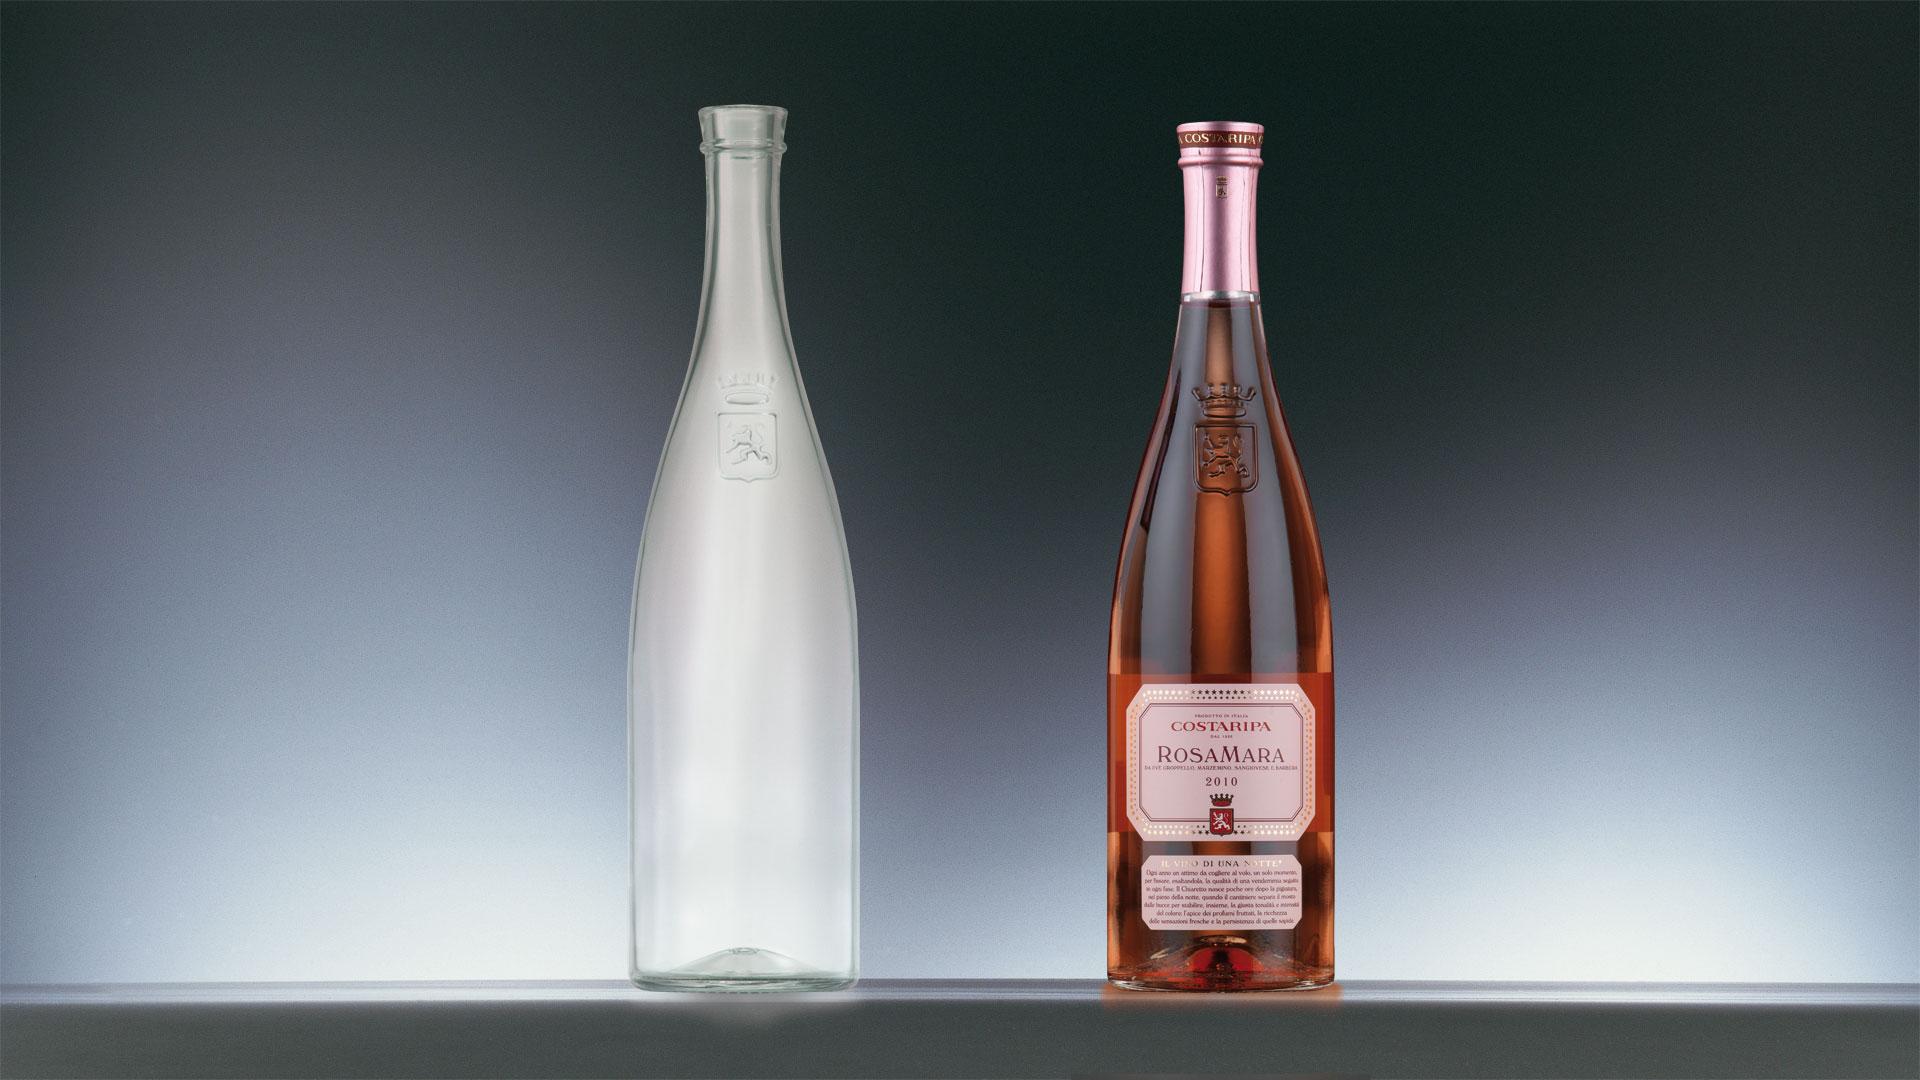 Costaripa bottle design